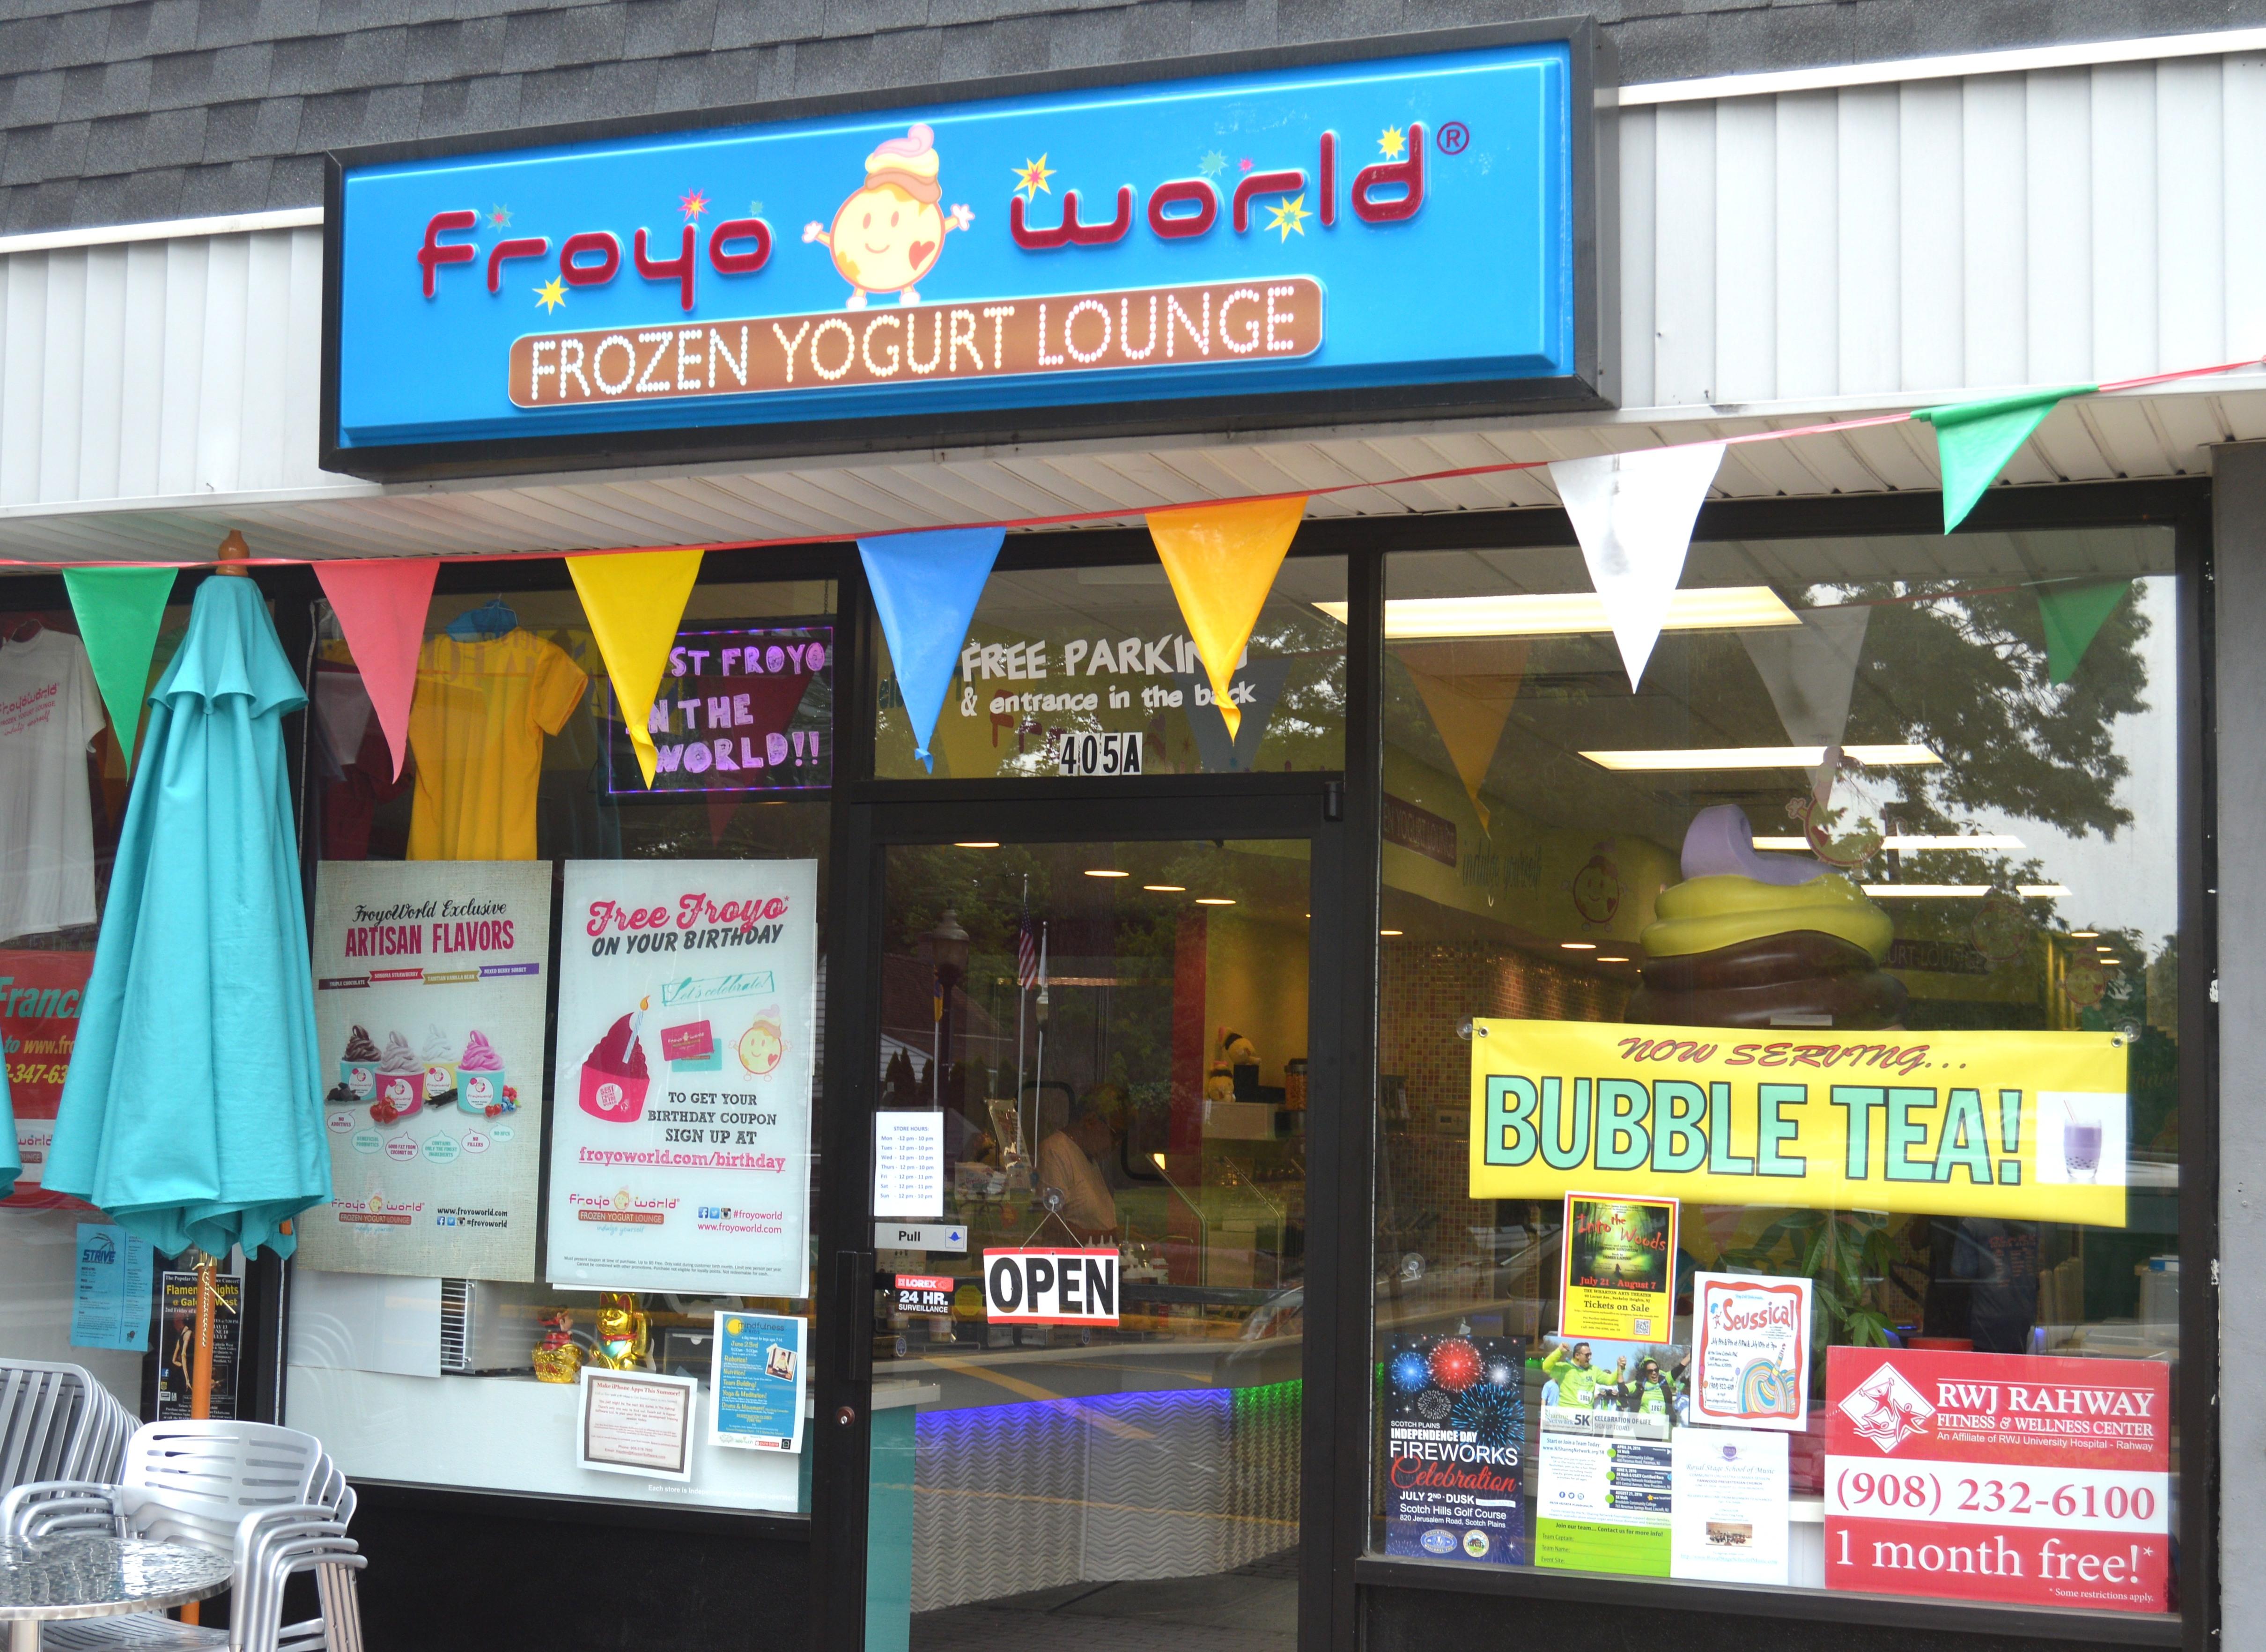 9f43d8684b8525ea5008_FroyoWorld_-_Bubble_Tea_sign.JPG